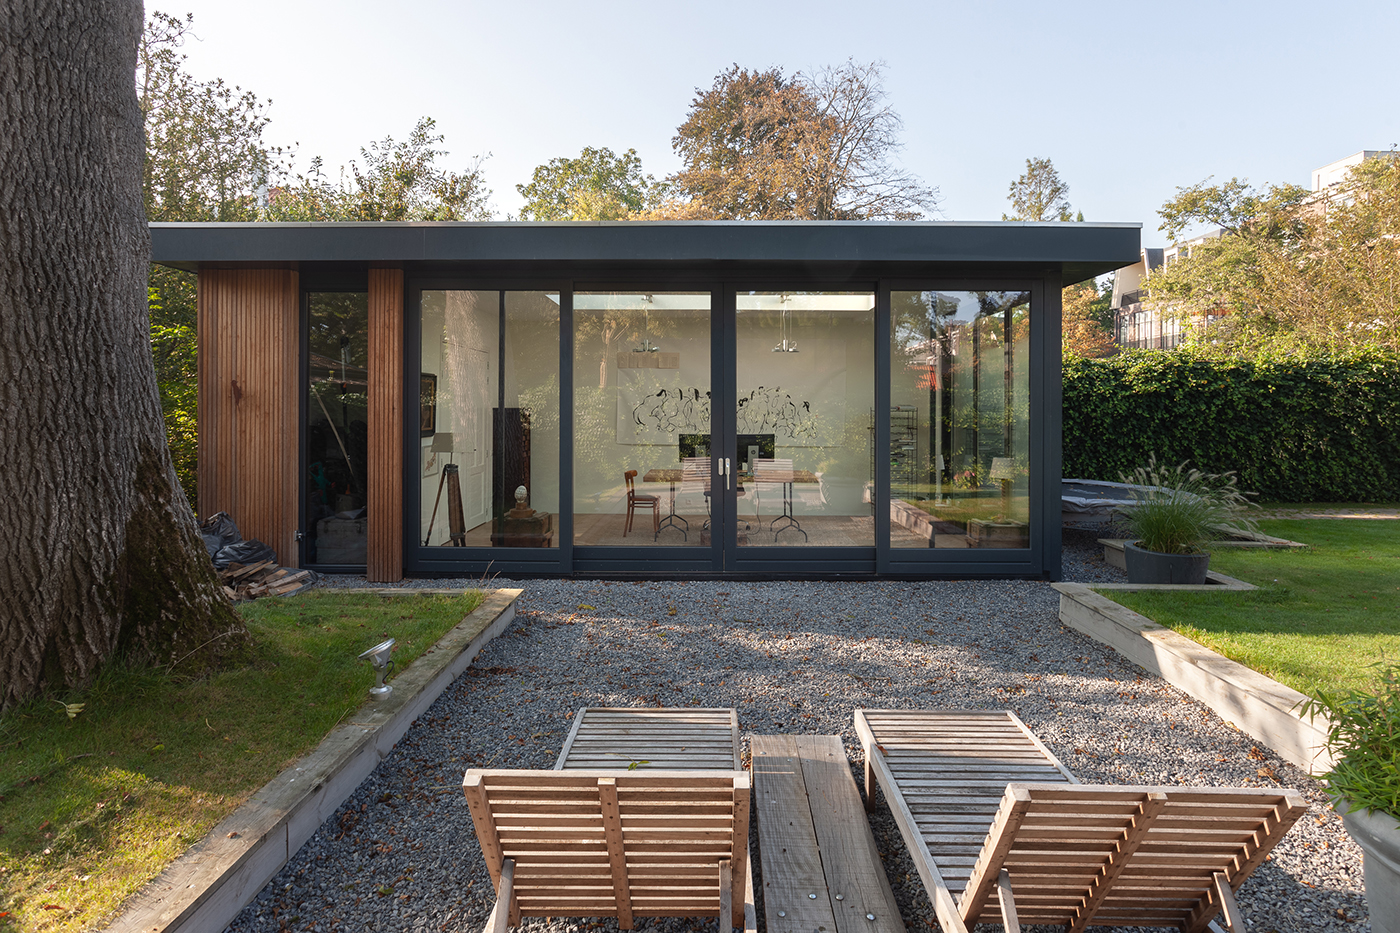 Aanbouw D+P exterieur 4 tuinhuis